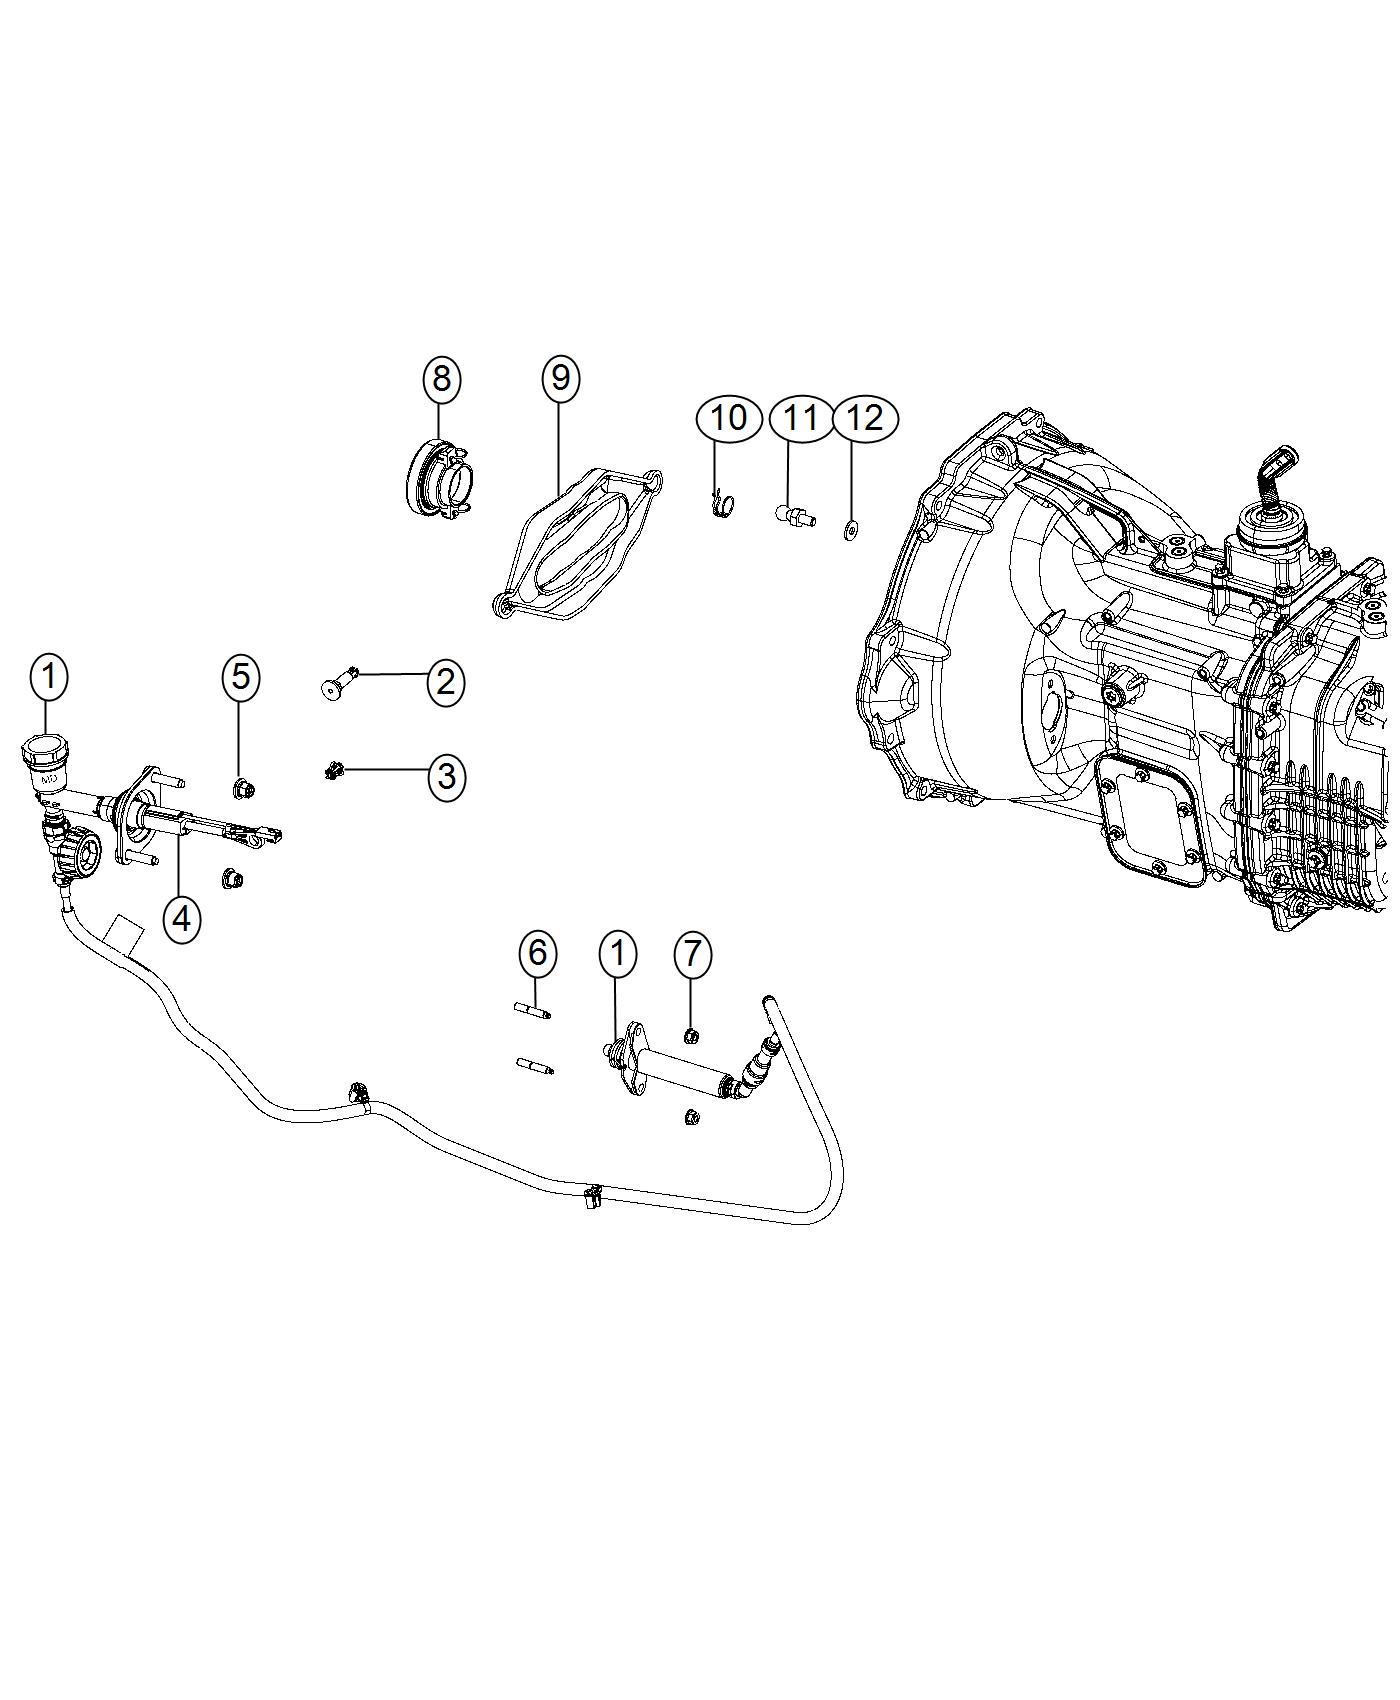 Jeep Wrangler Hydraulic Assembly Hydraulic Assy